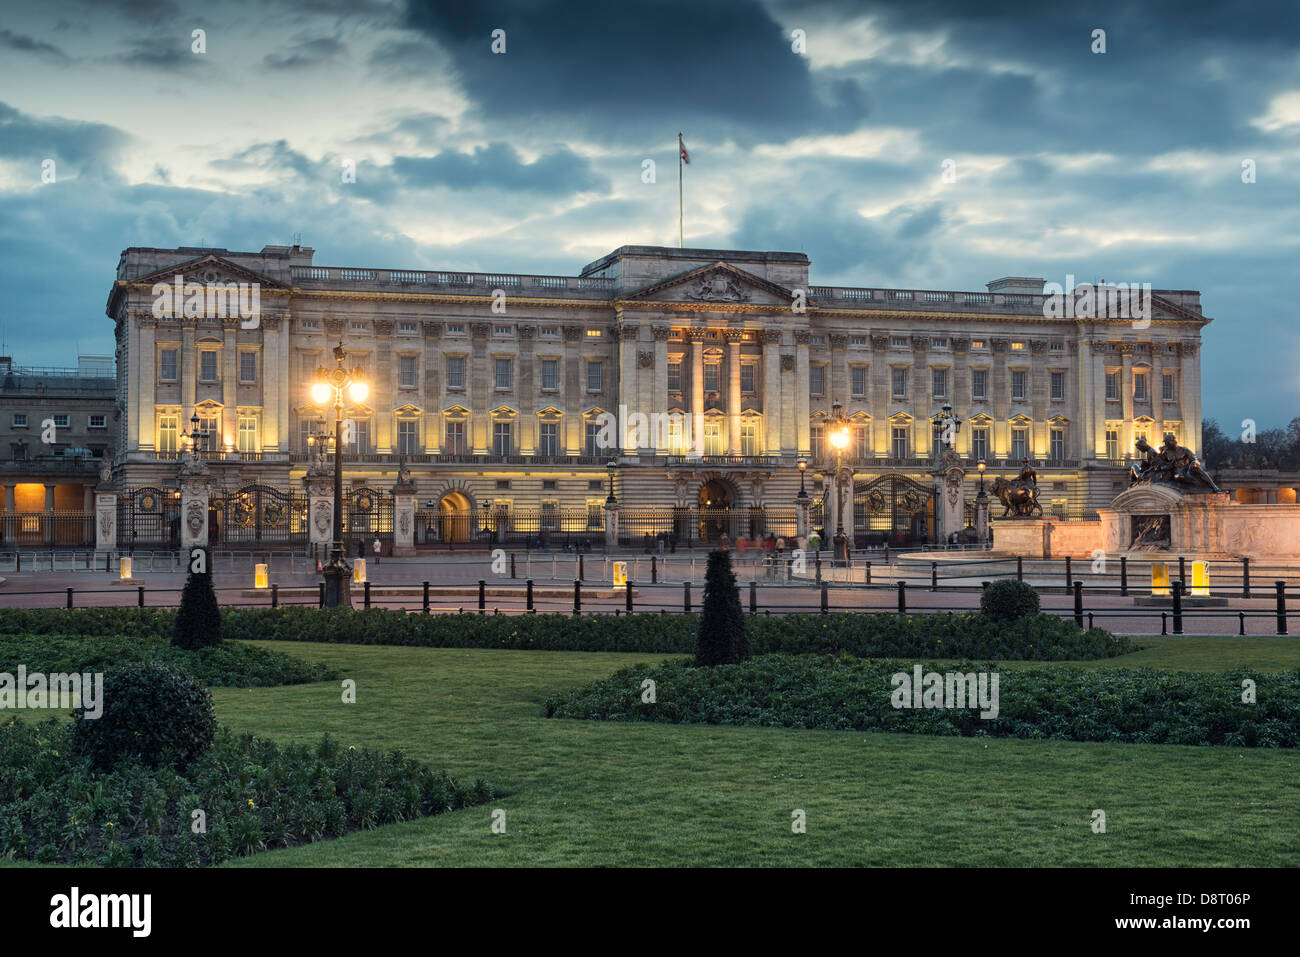 Buckingham-Palast in der Nacht, London, England, Stockbild